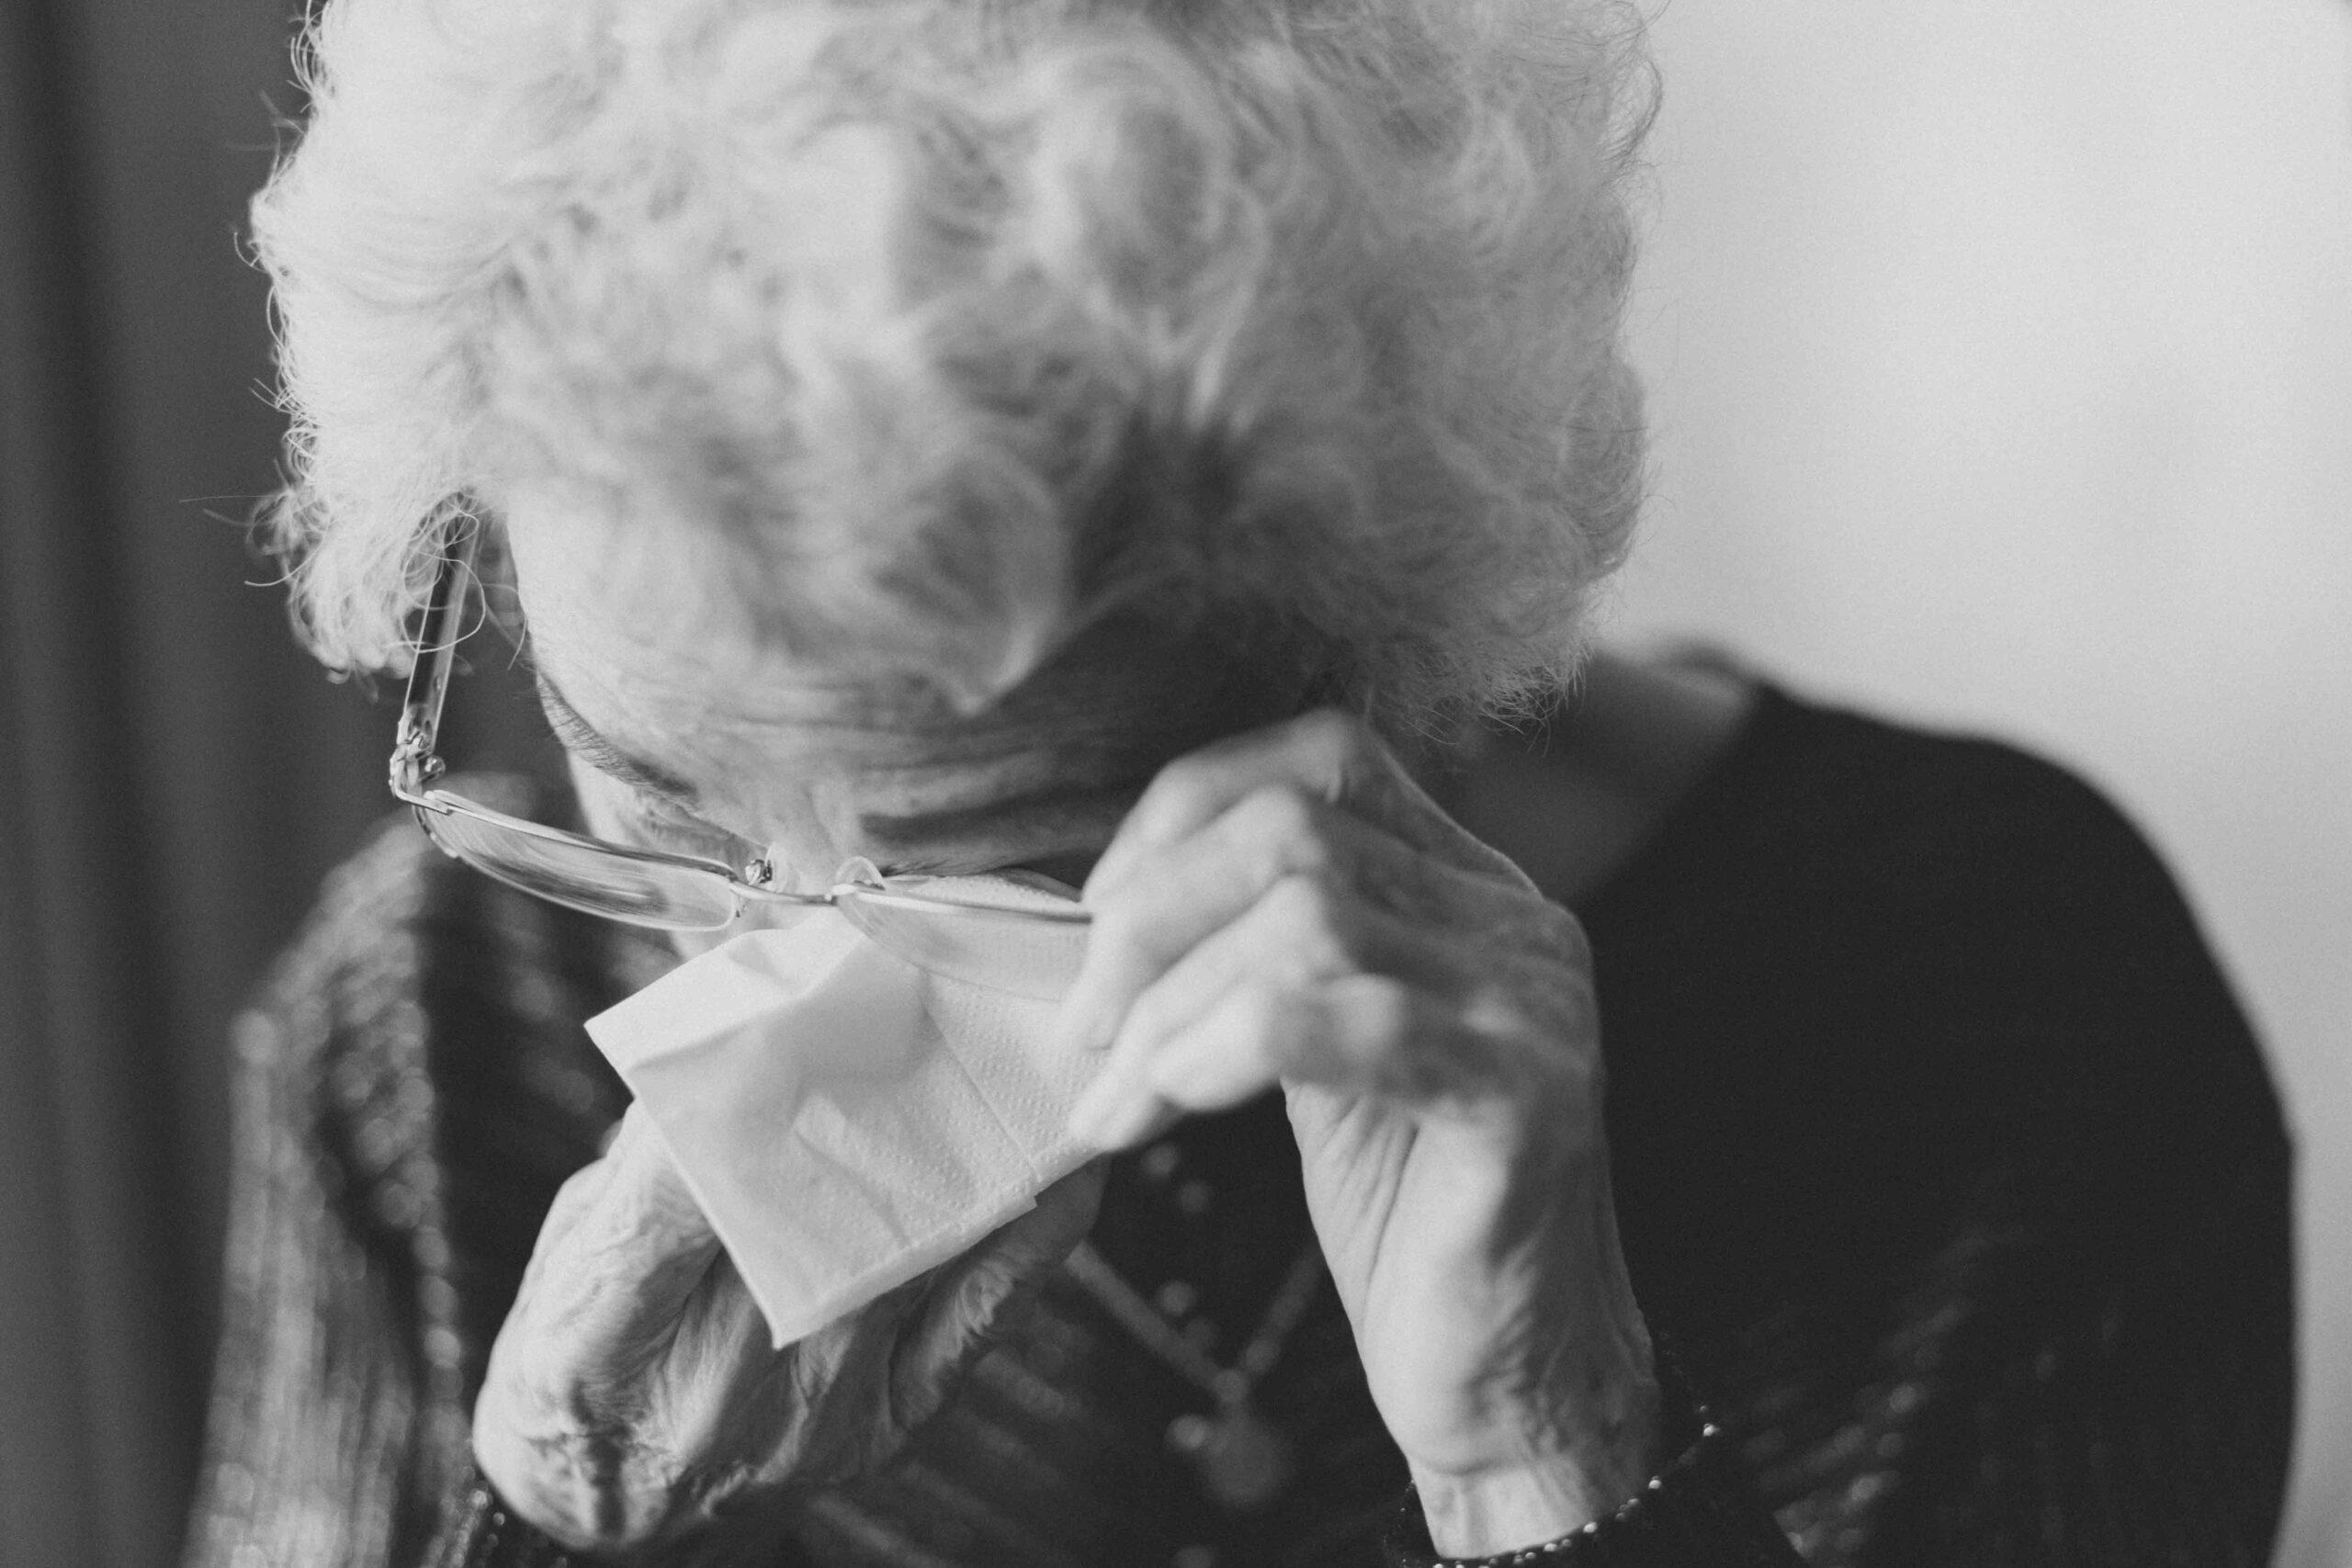 Mujer llorando sujetando un pañuelo